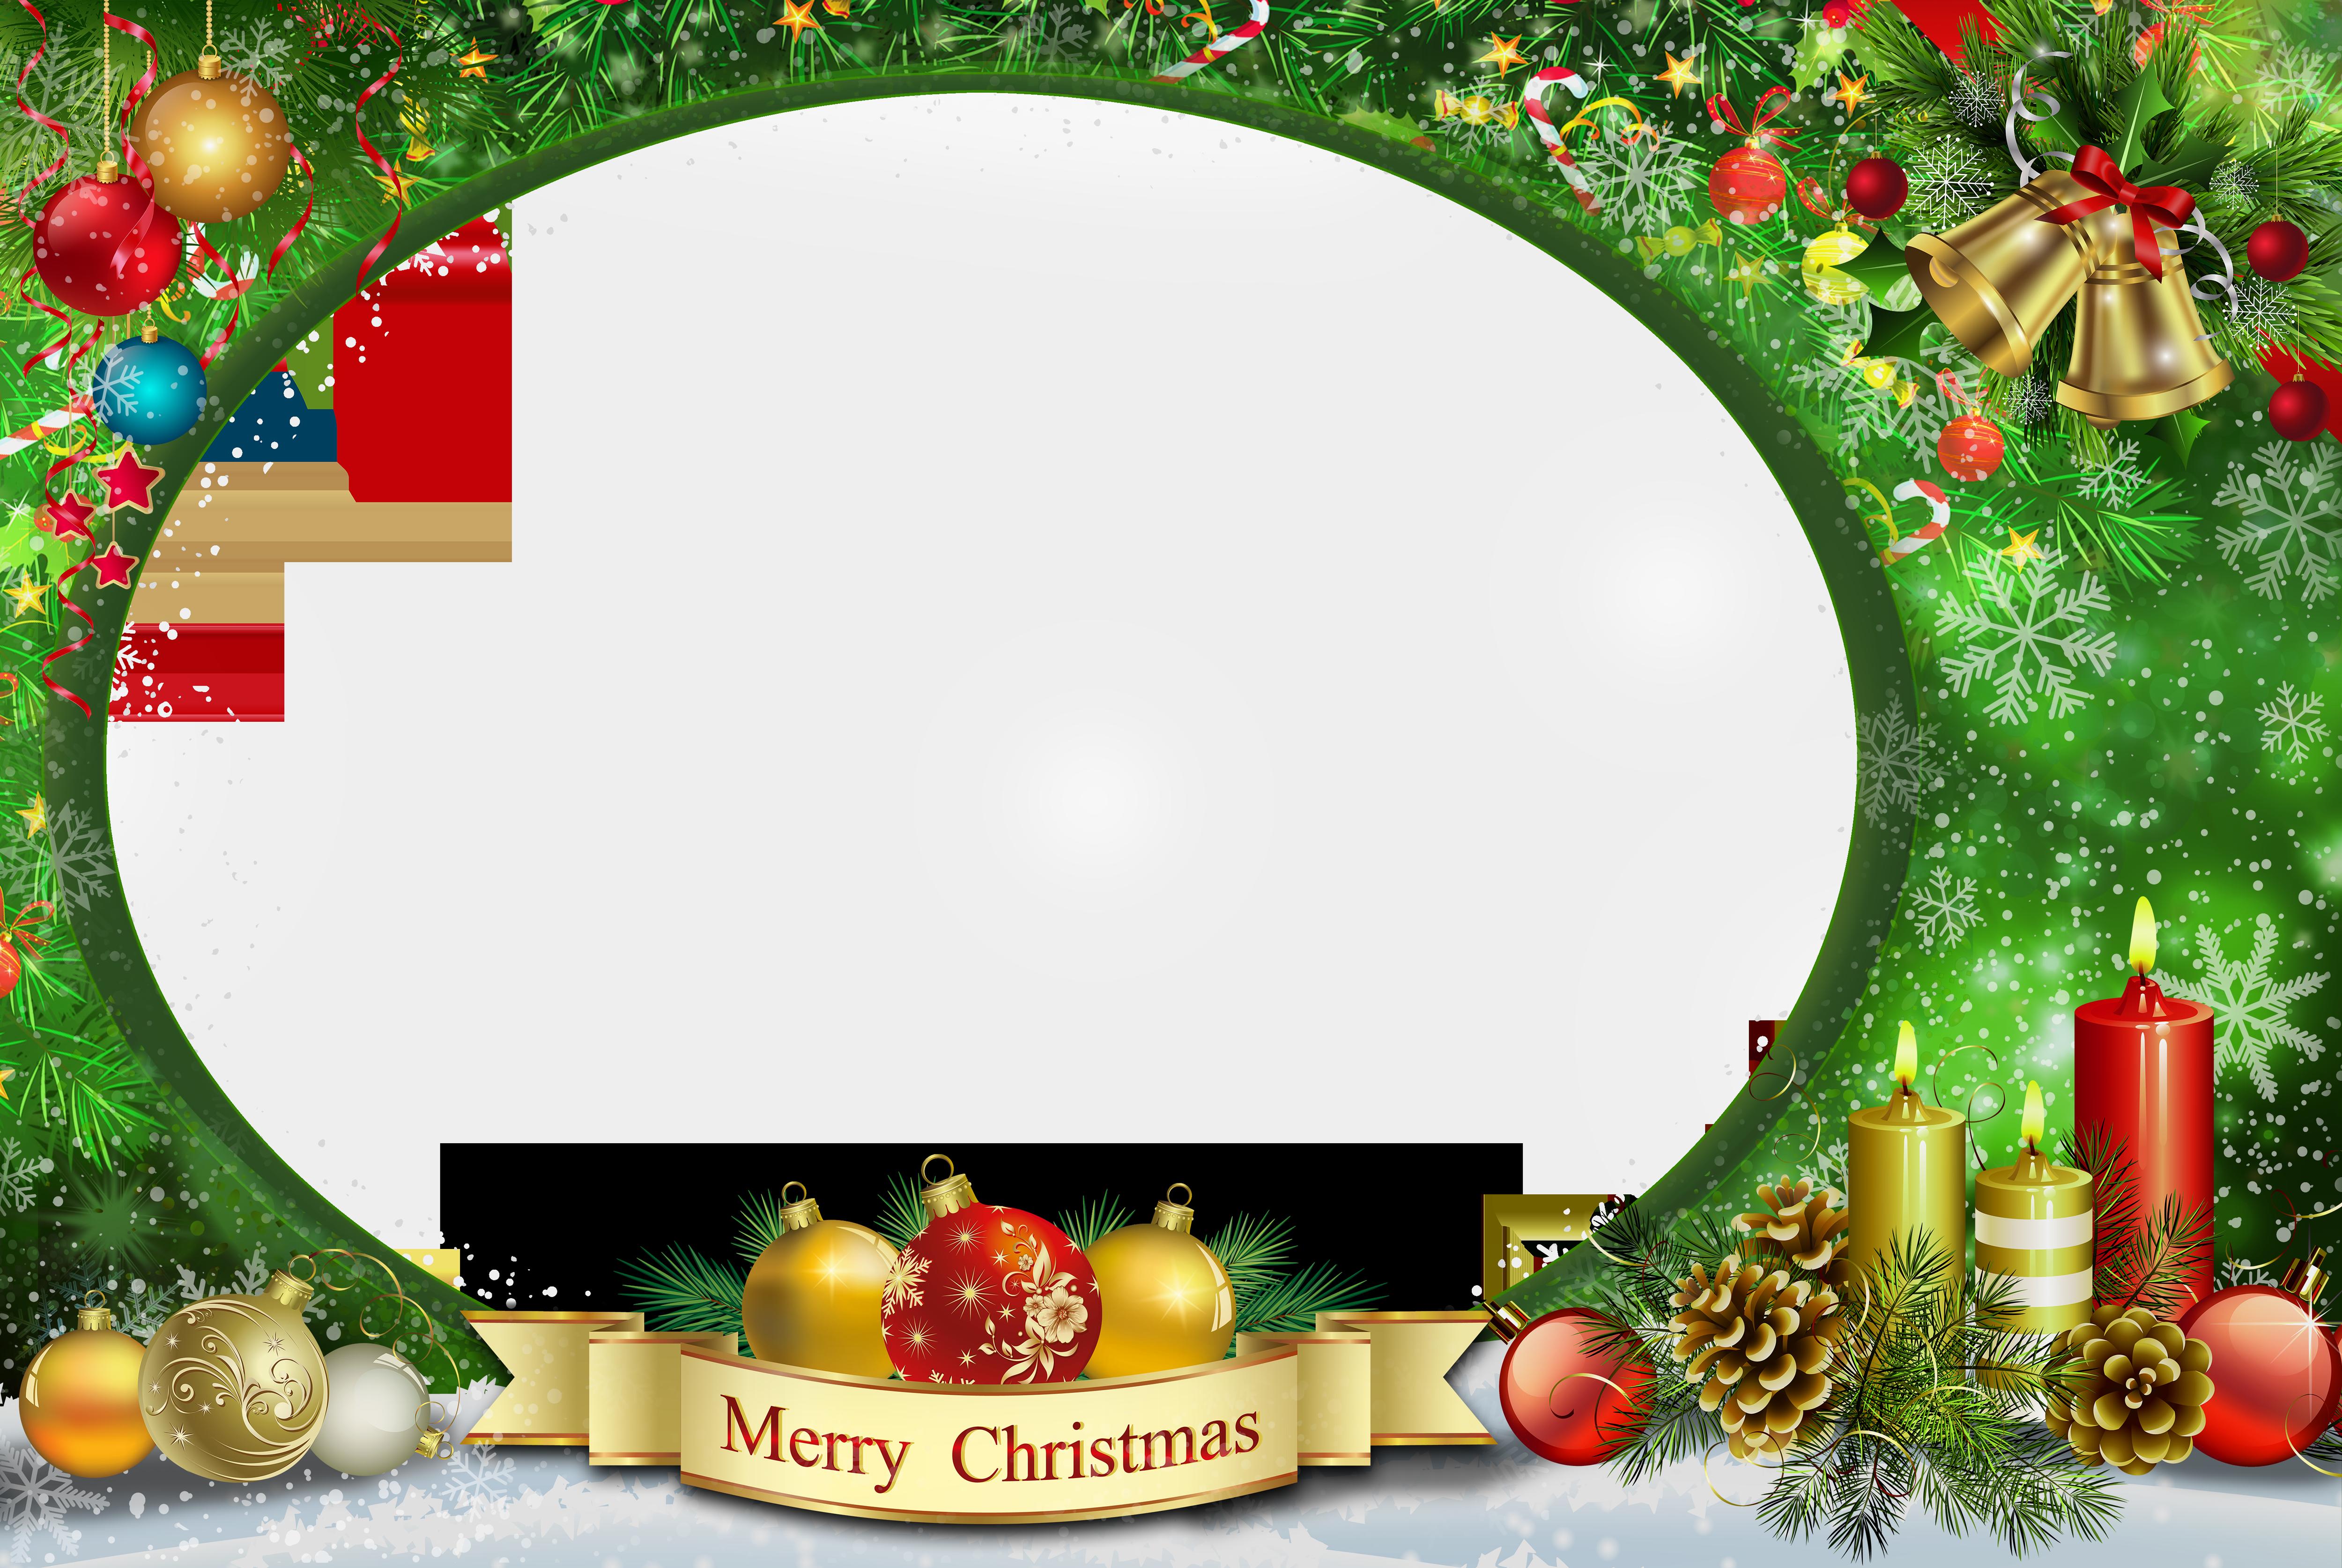 Transparent christmas png image. Clipart gun frame